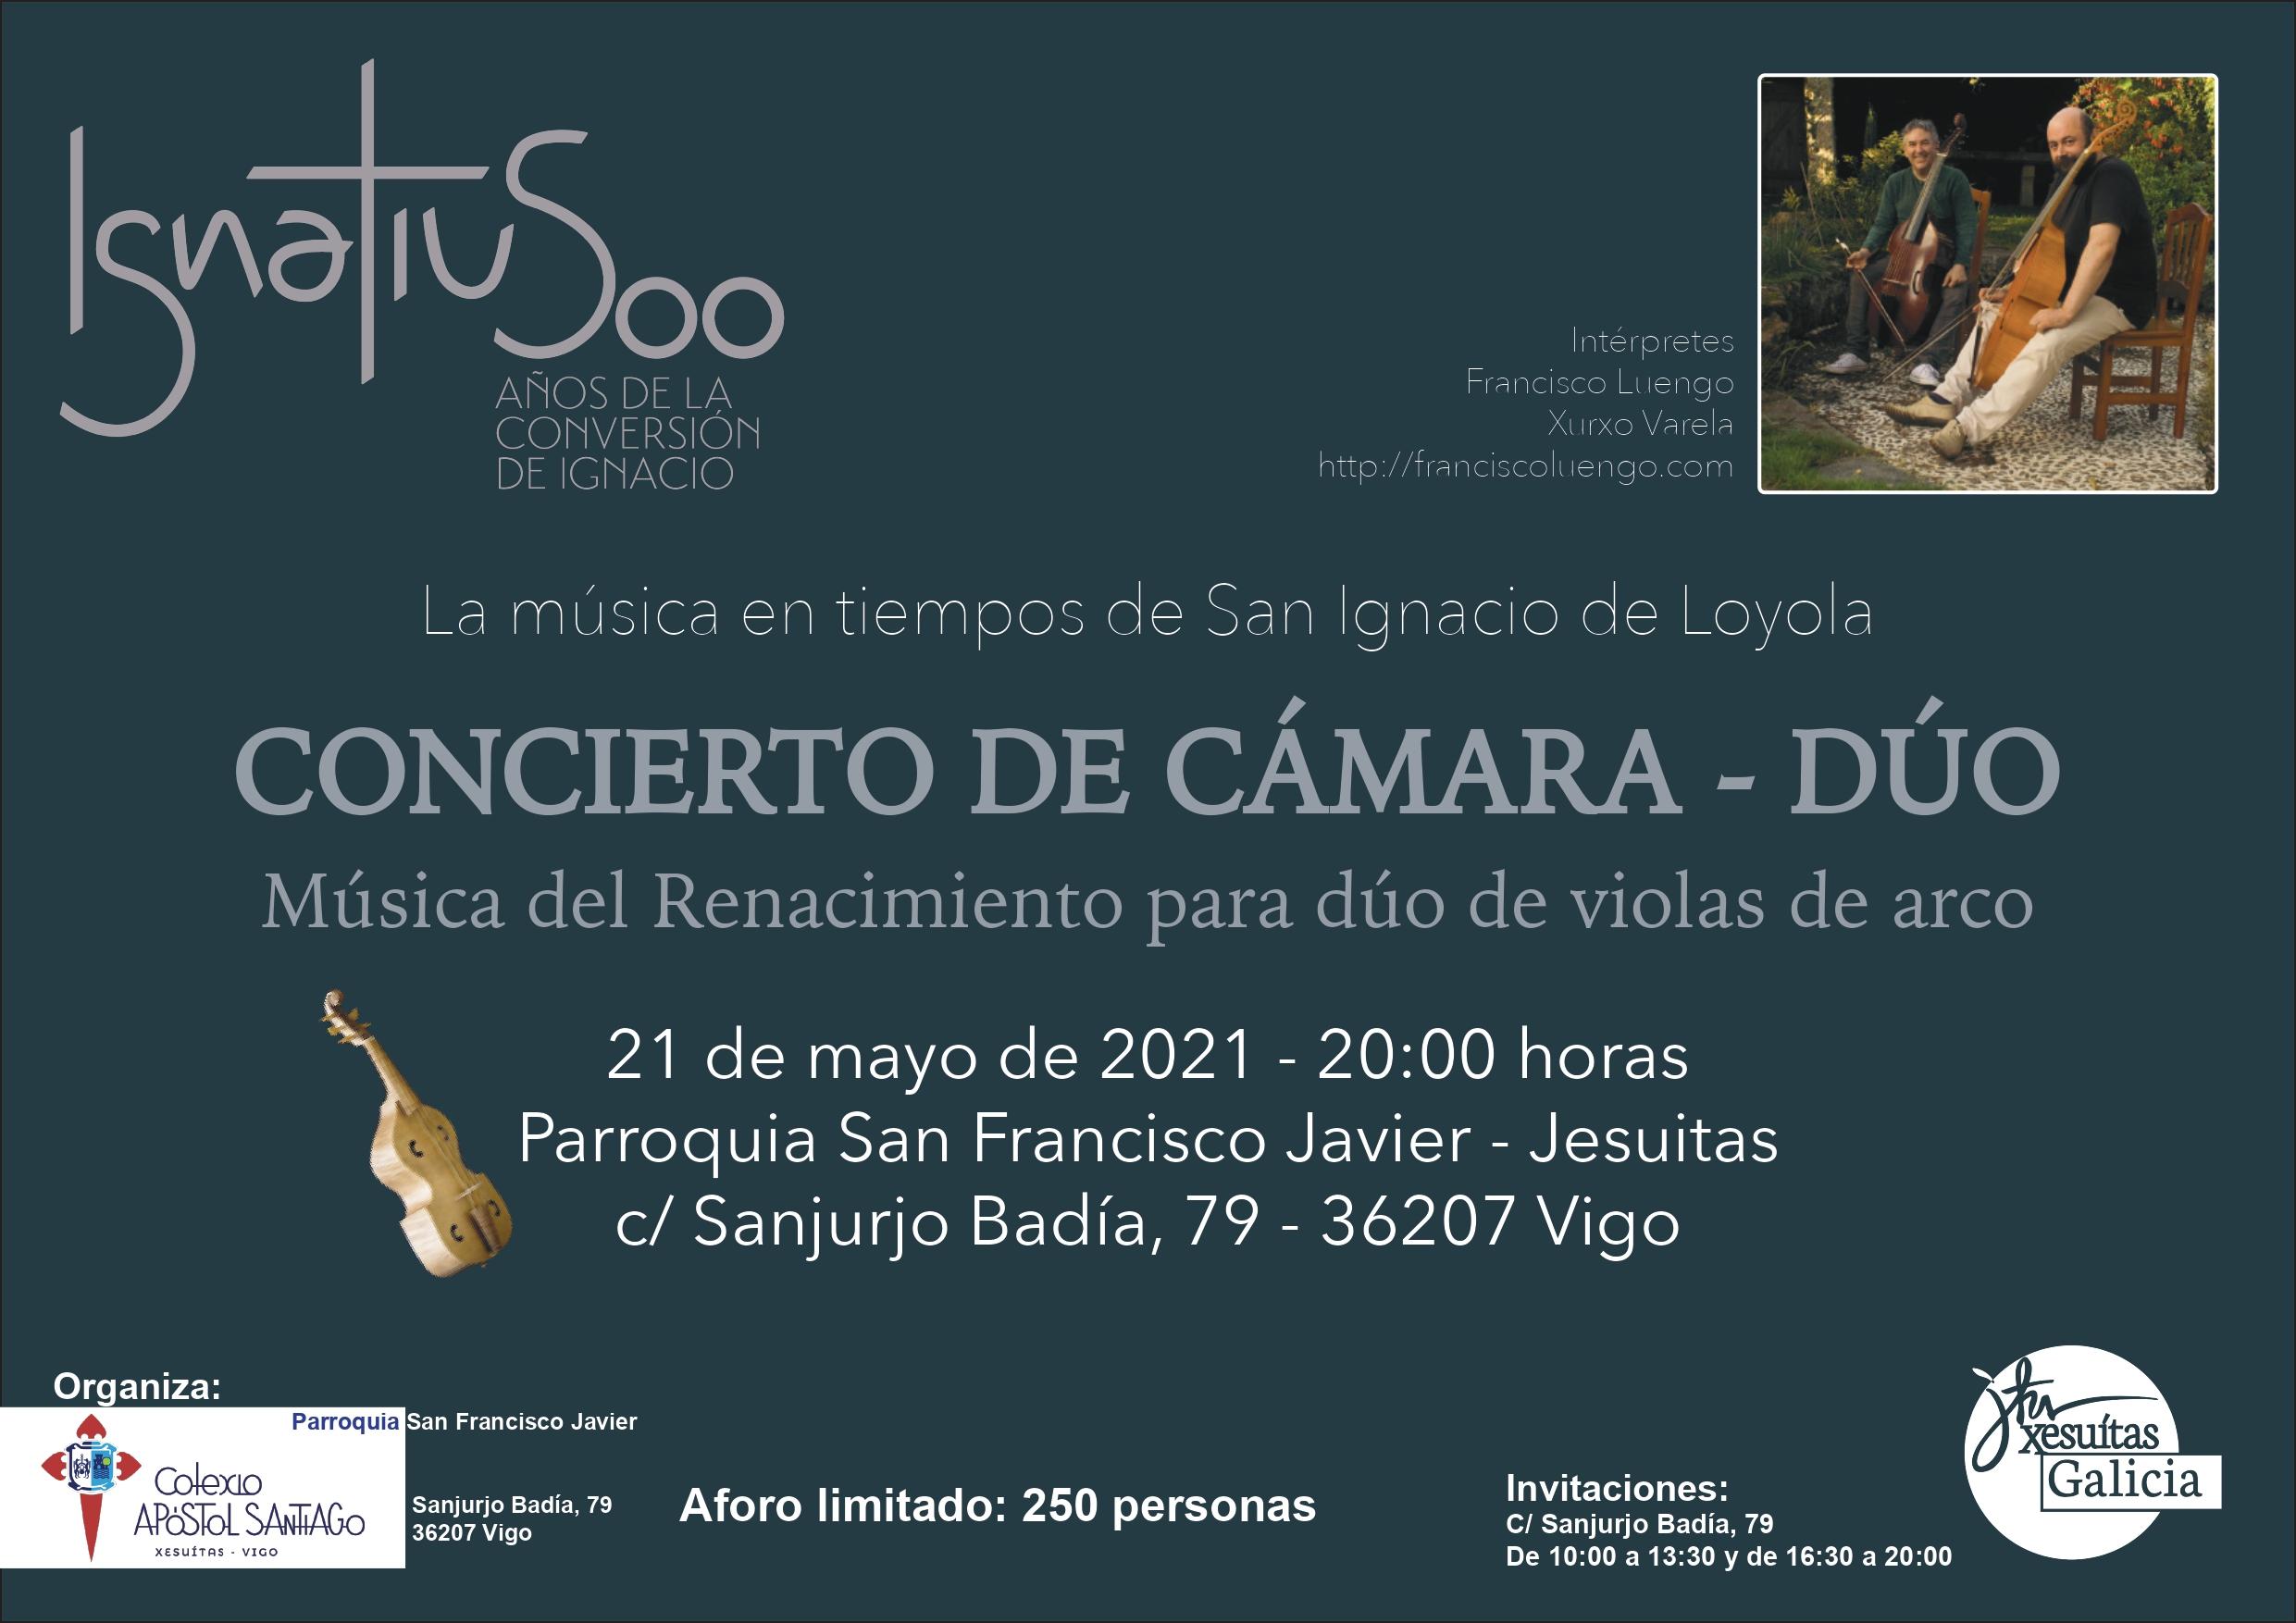 Estreamos o Ano Ignaciano – Ignatius 500 cun concerto de cámara